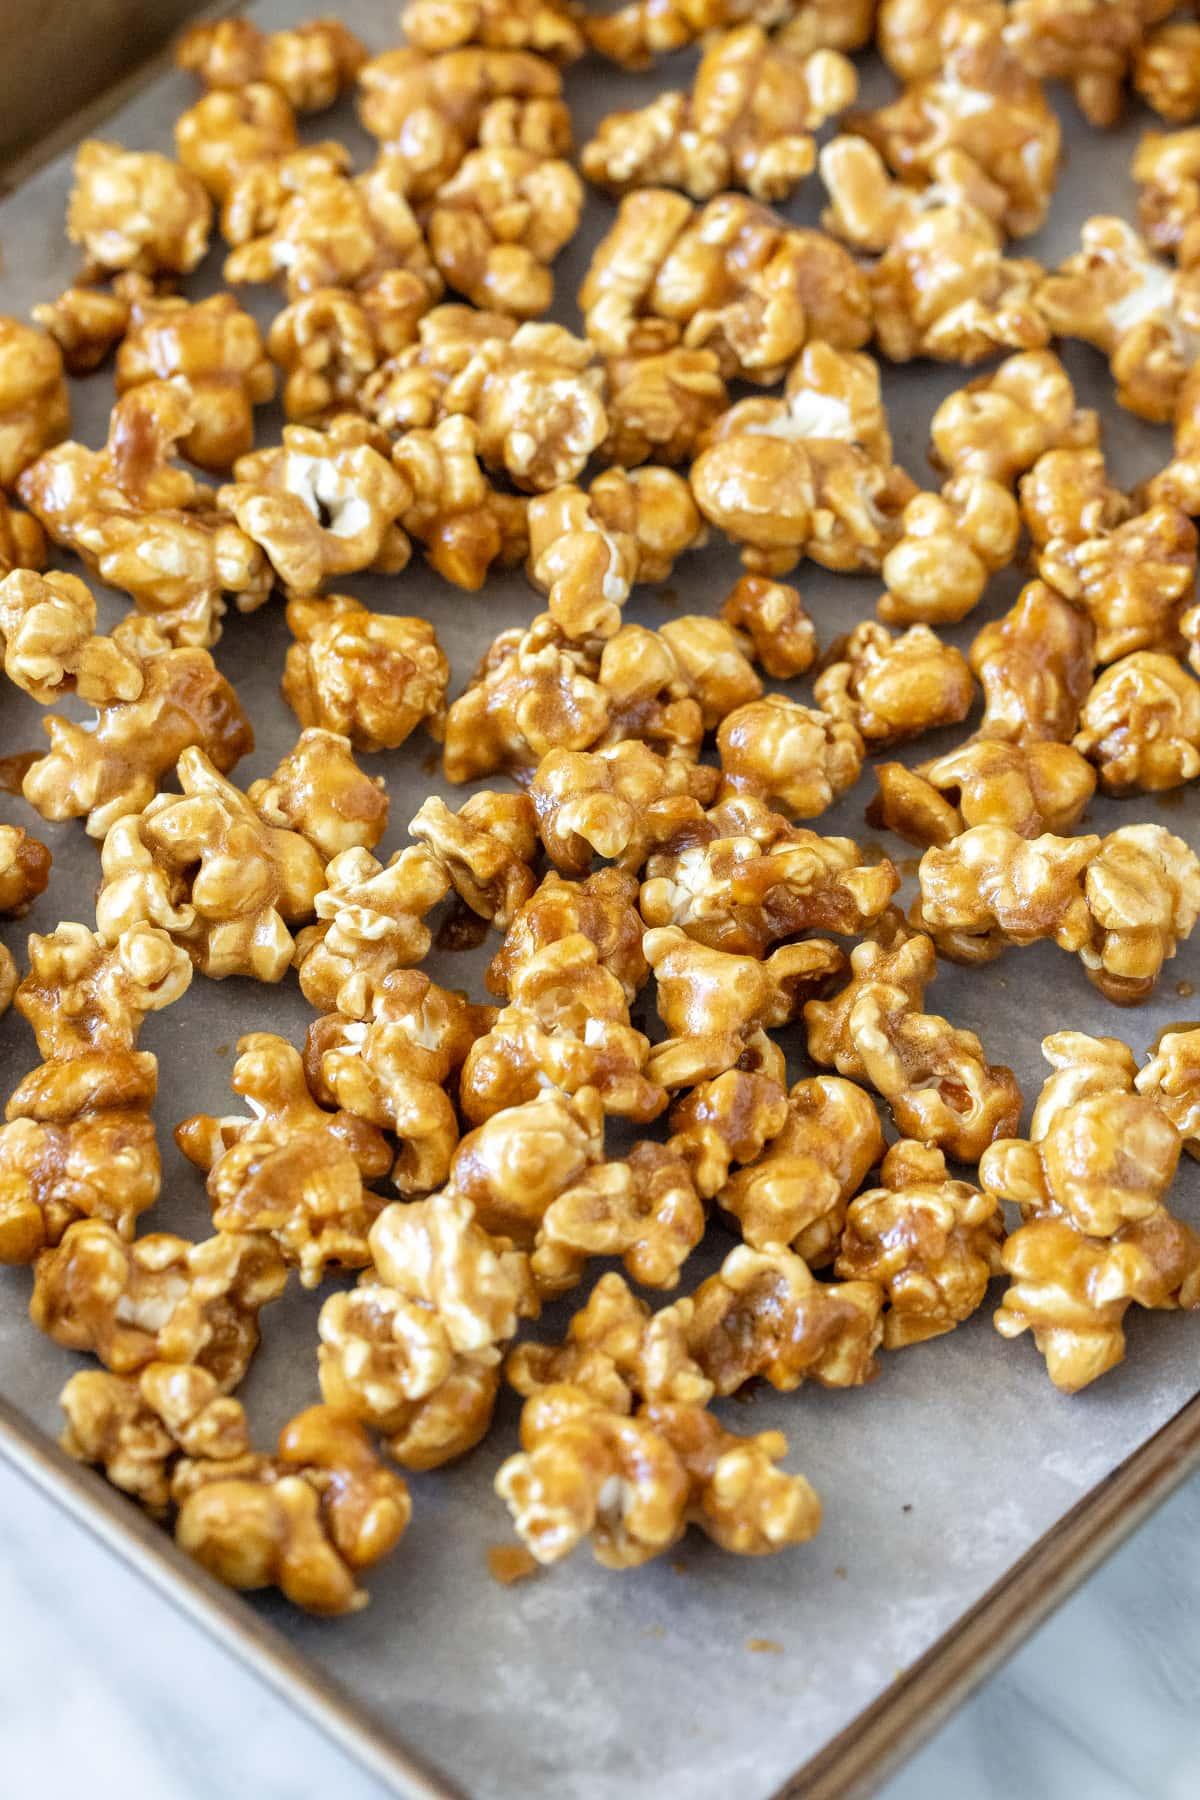 Caramel popcorn on a baking sheet